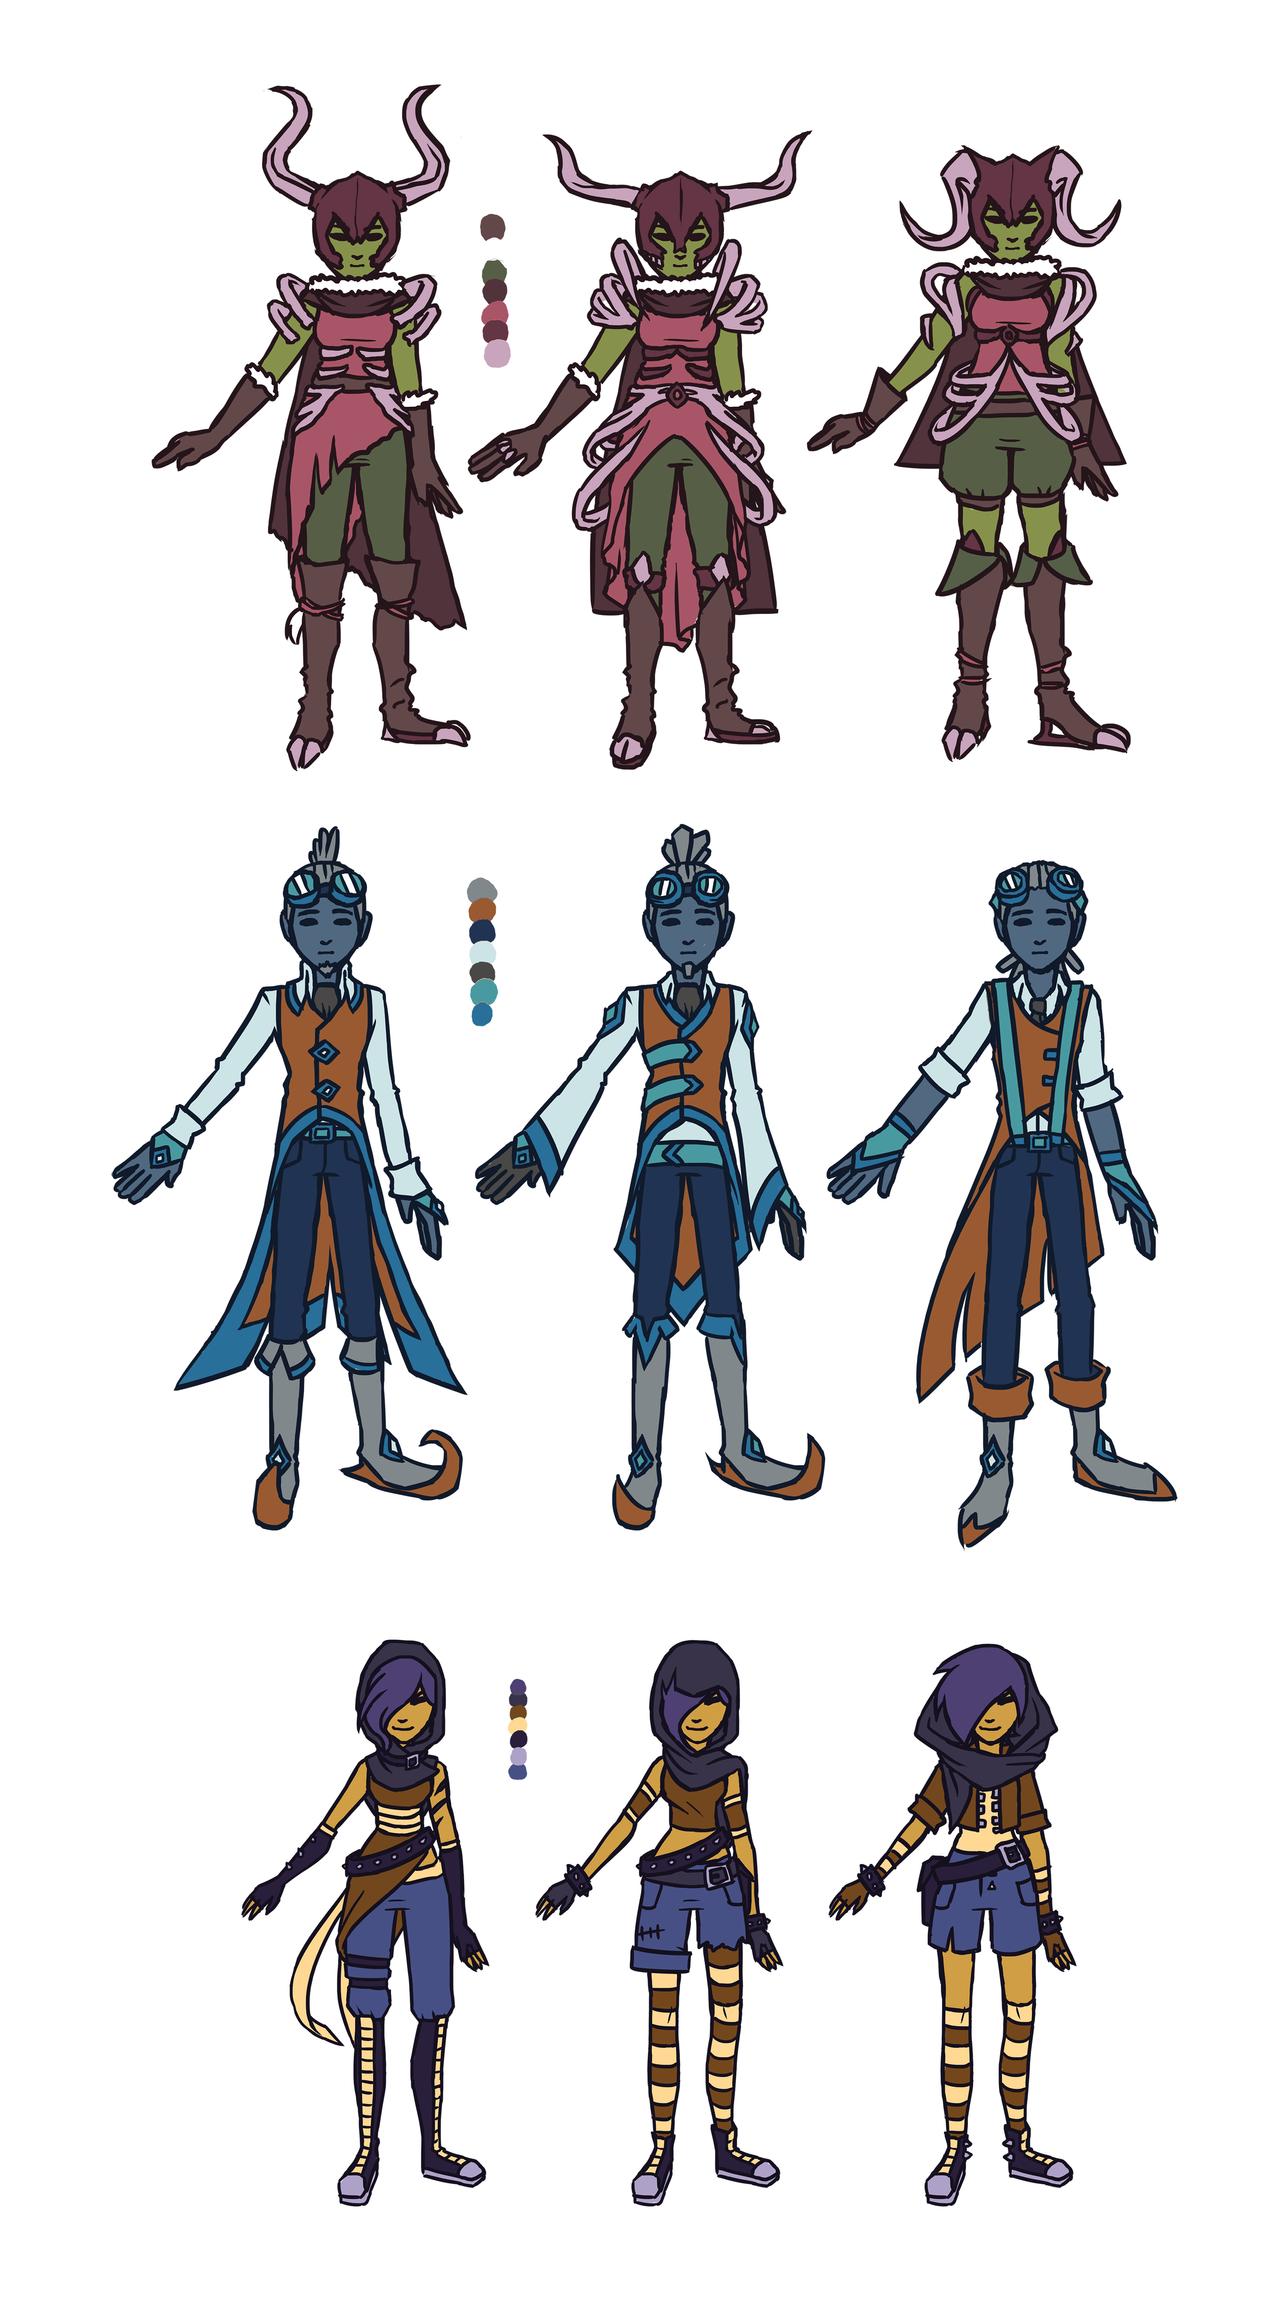 Character Design Set : Zodiac character design set by greenmangos on deviantart